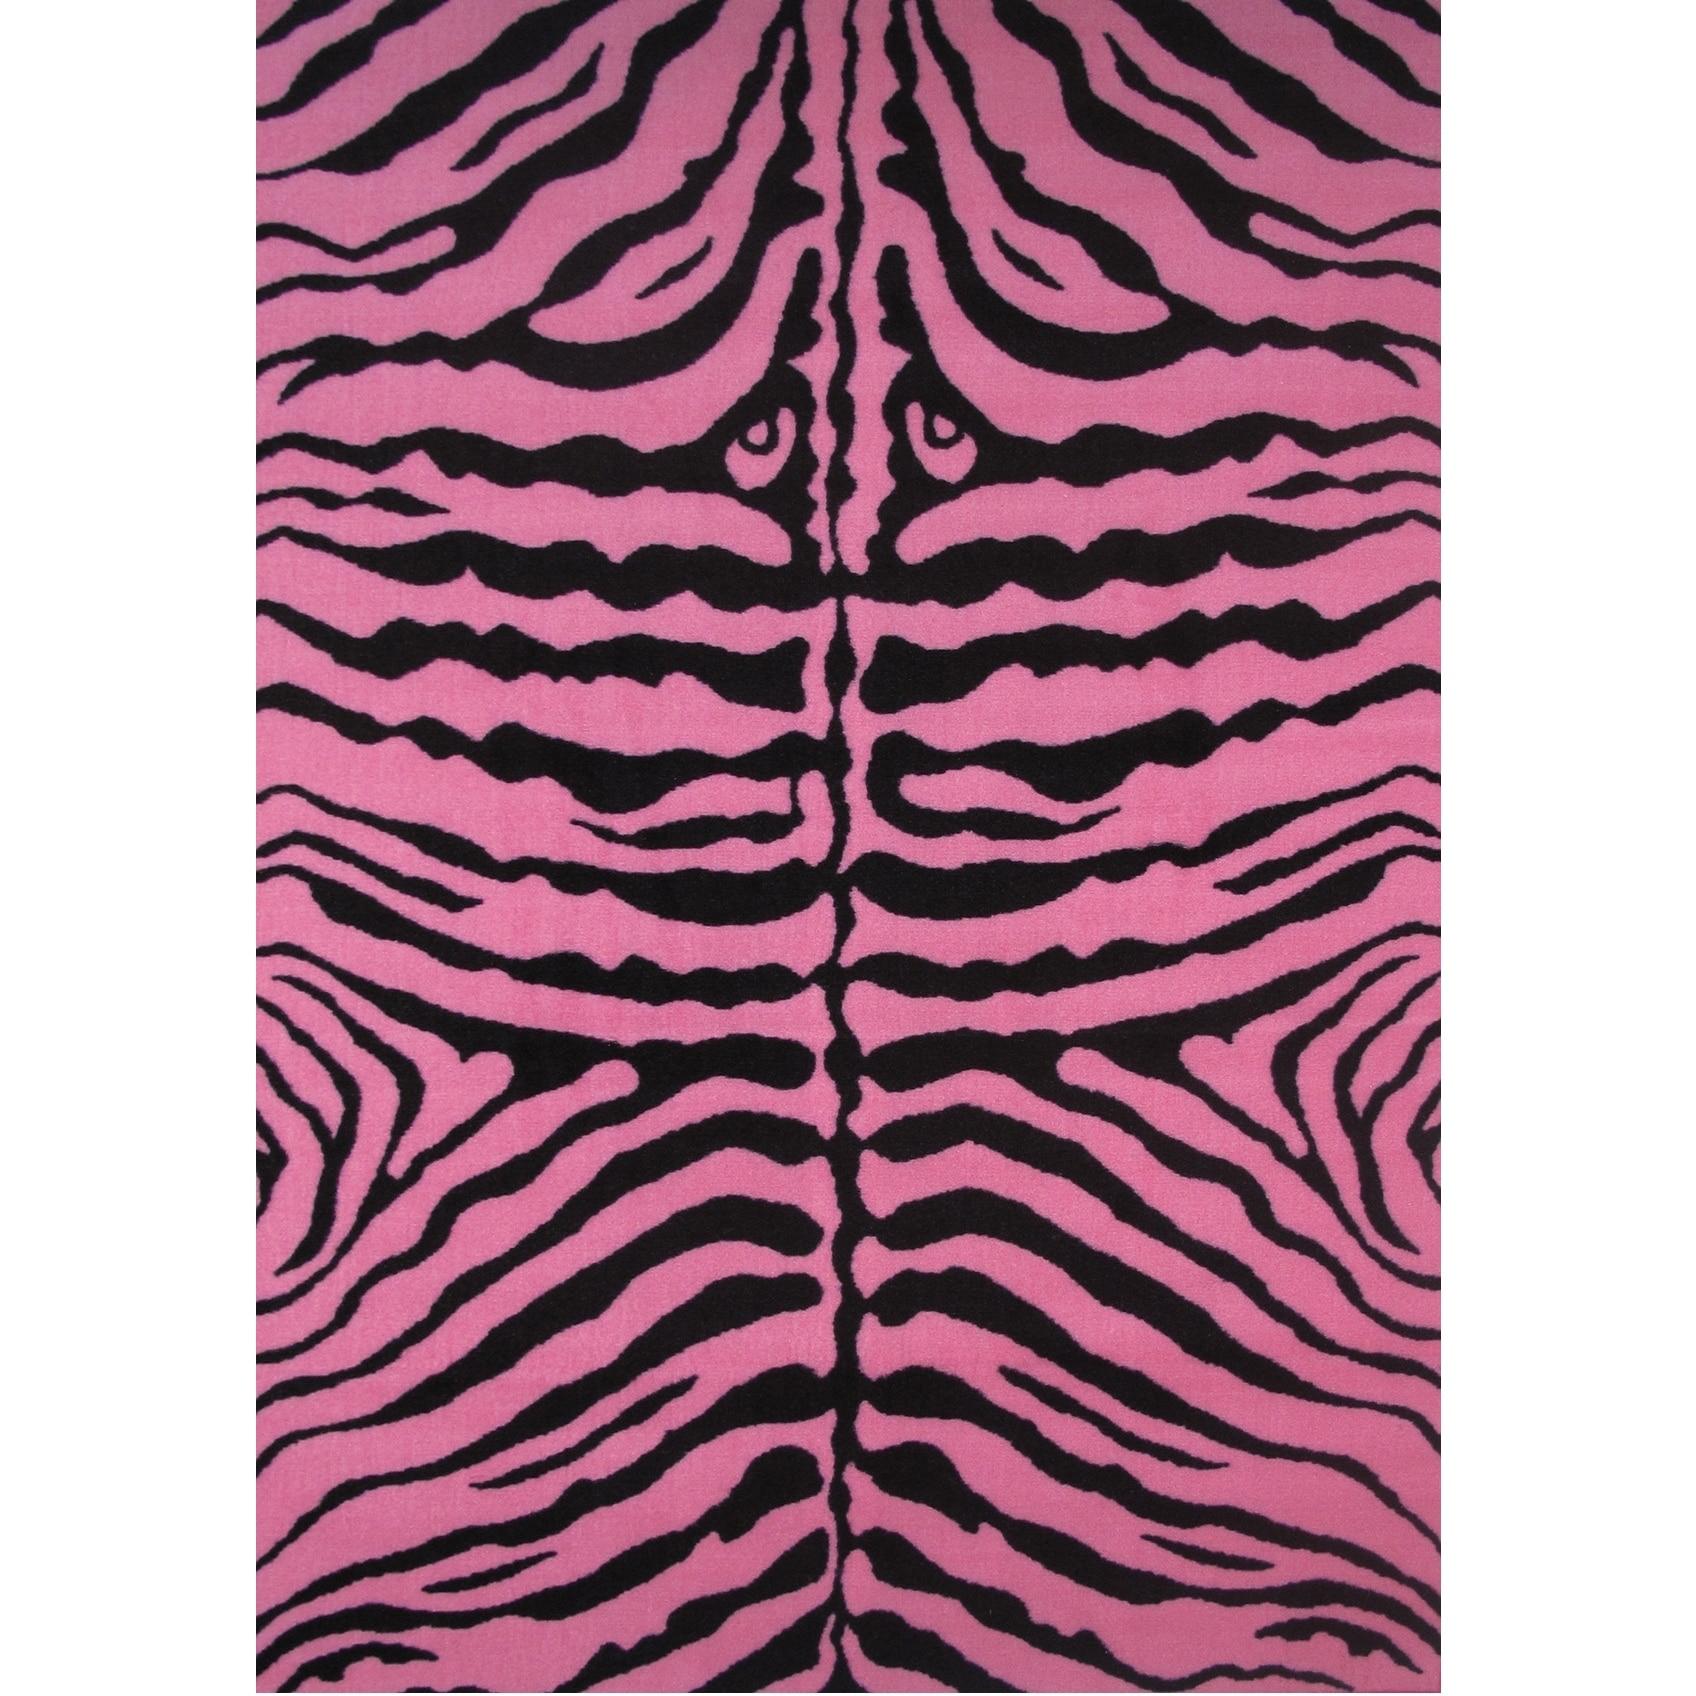 LA RUG Zebra Pink Accent Rug (3'3 x 4'8) (39 inch x 58 in...